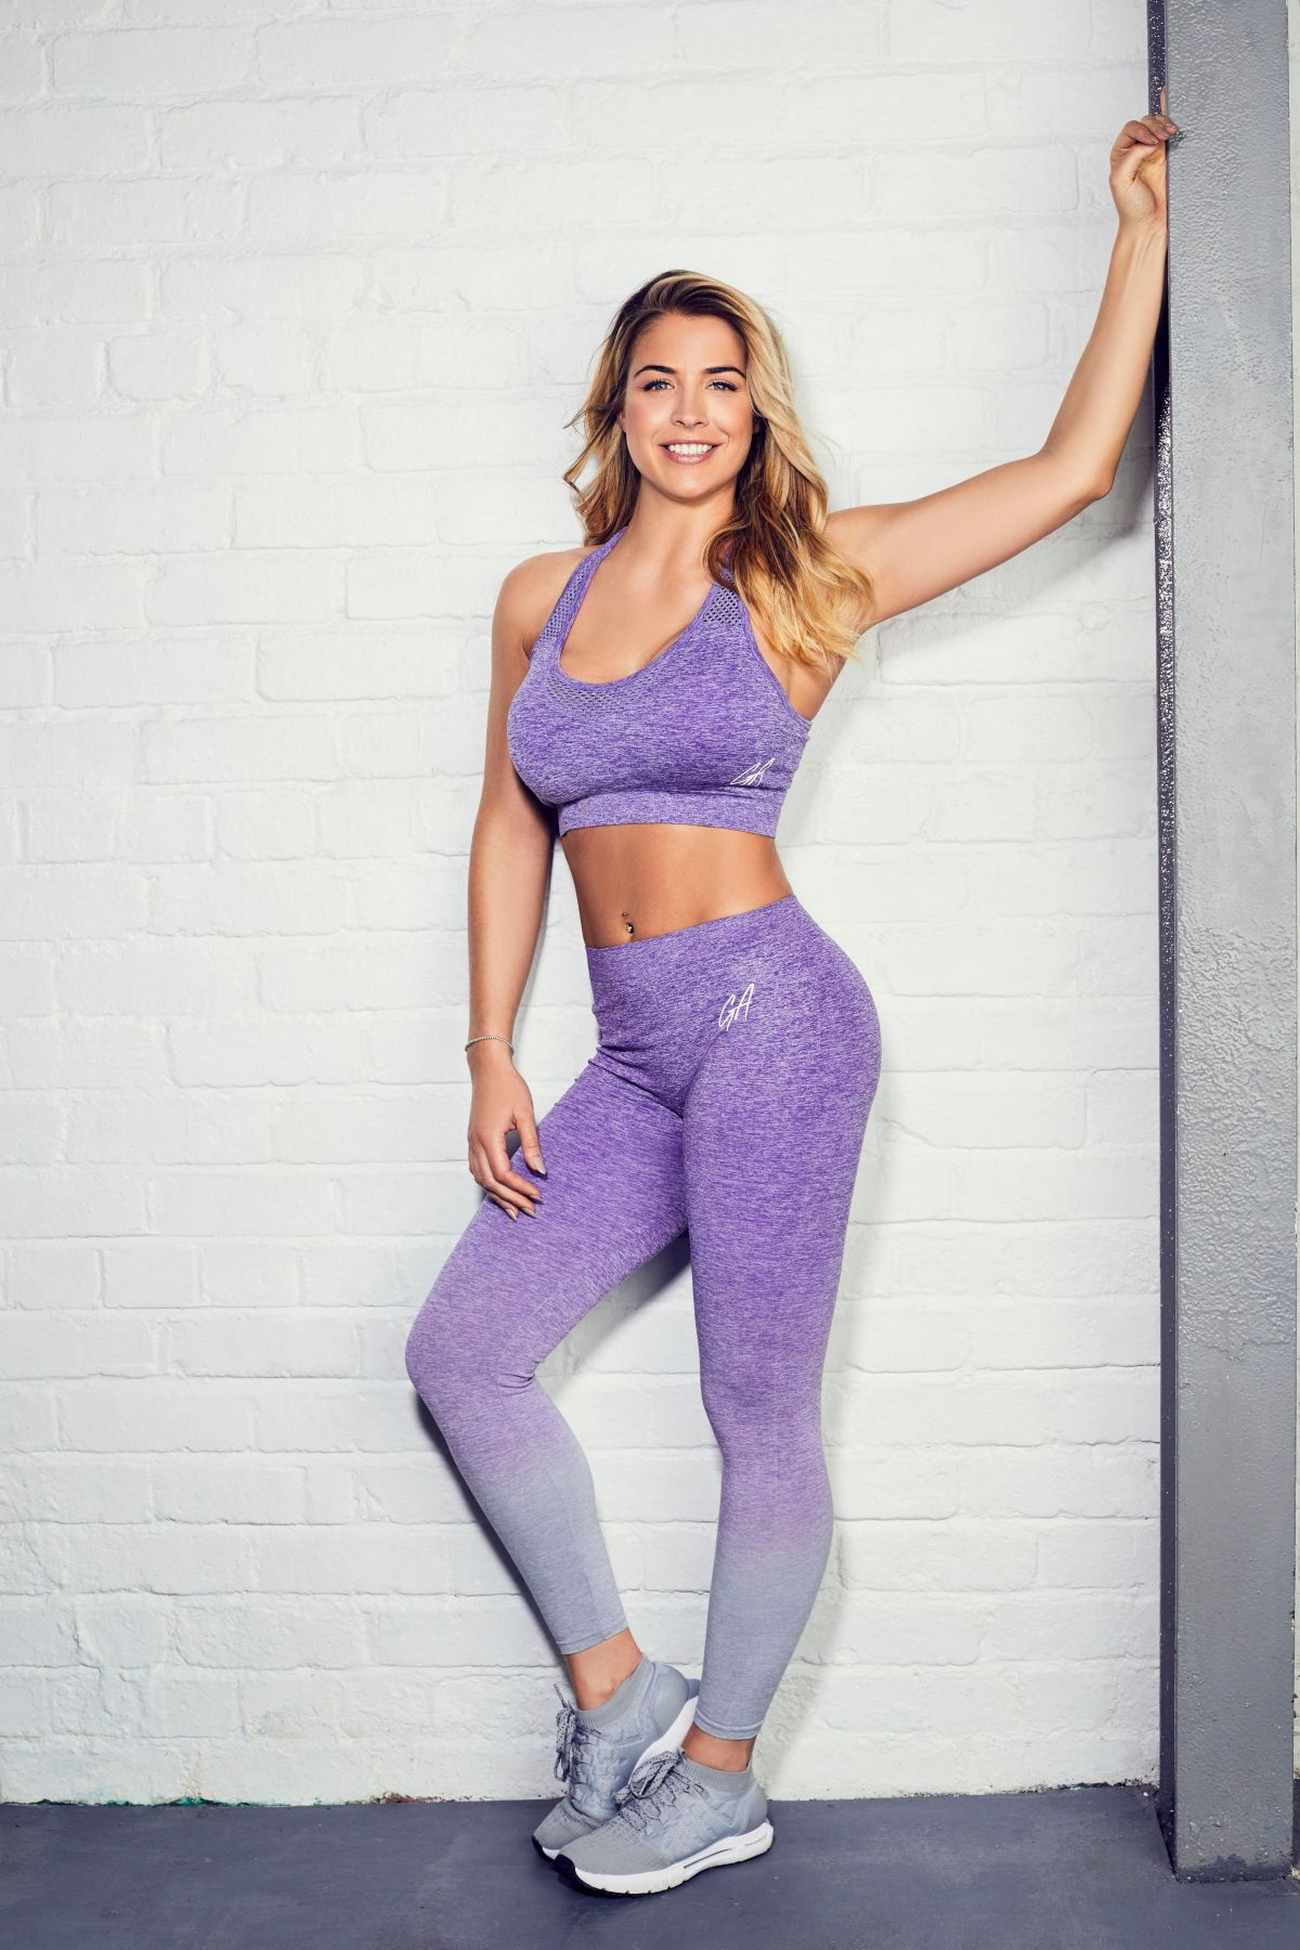 Gemma-Atkinson-GA-2018-Sportswear-Range-by-Gemma-Atkinson00002.jpg